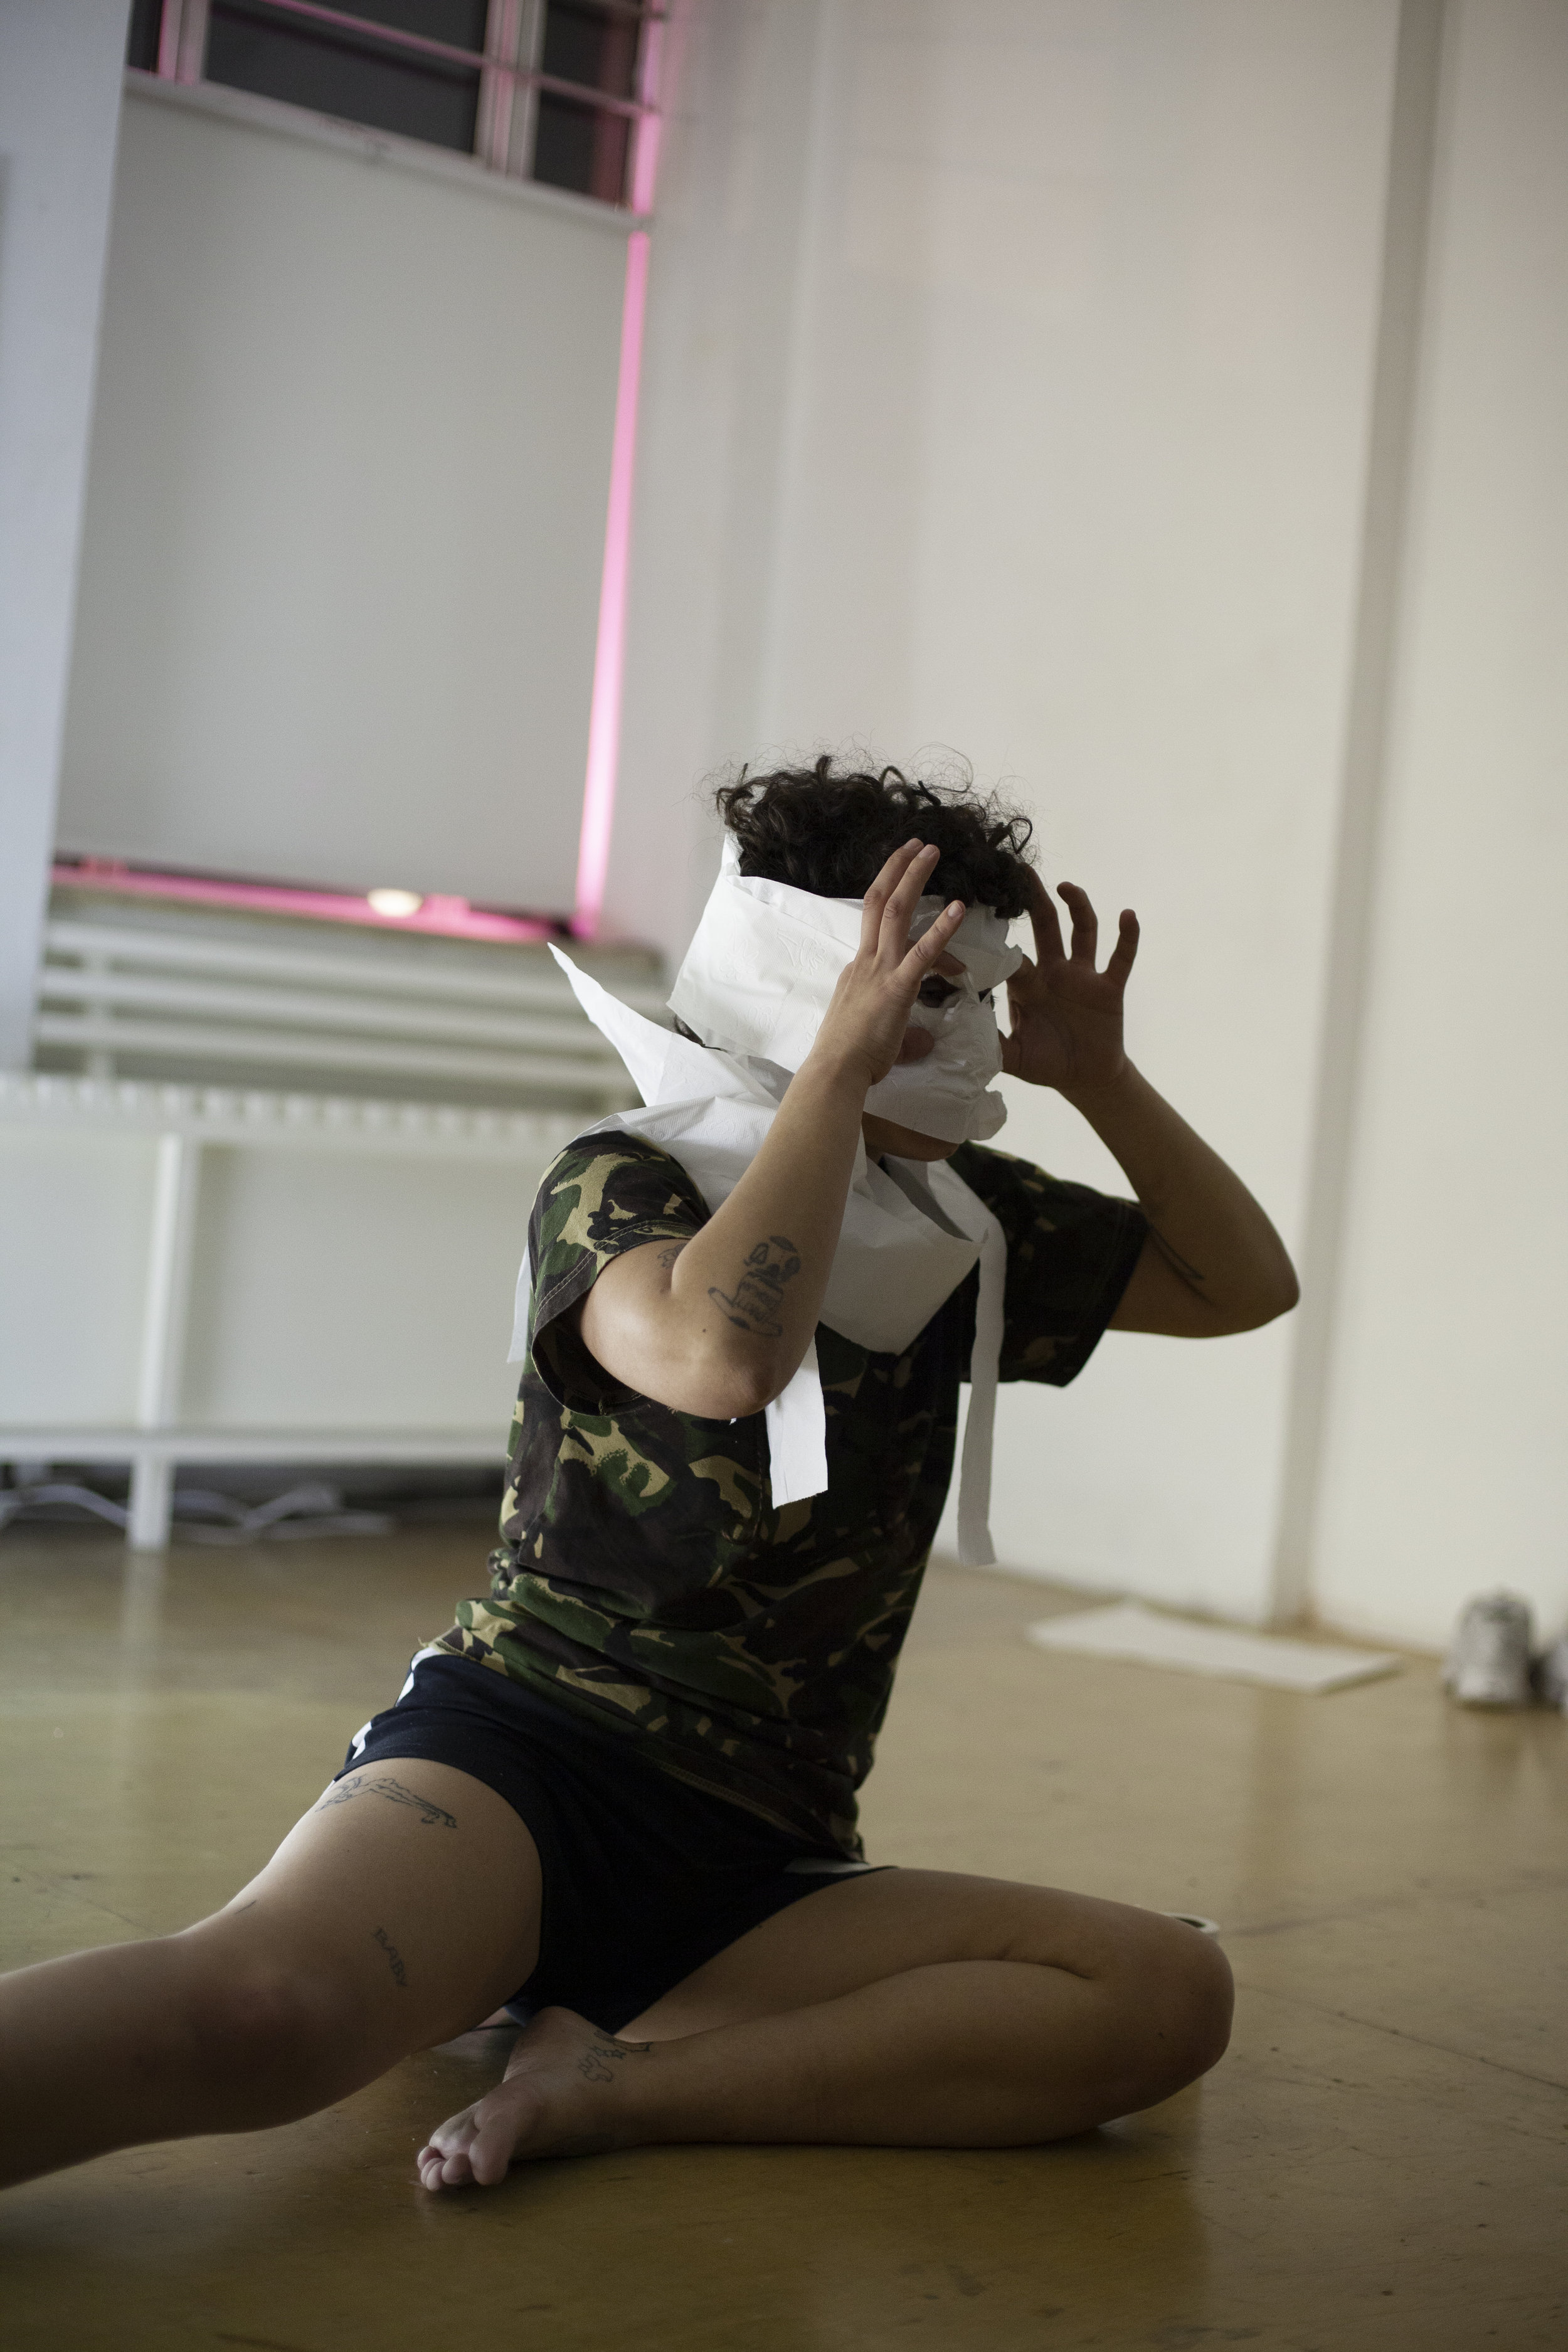 TheHoarder-Lorena-ElineBenjaminsen-17-1.jpg